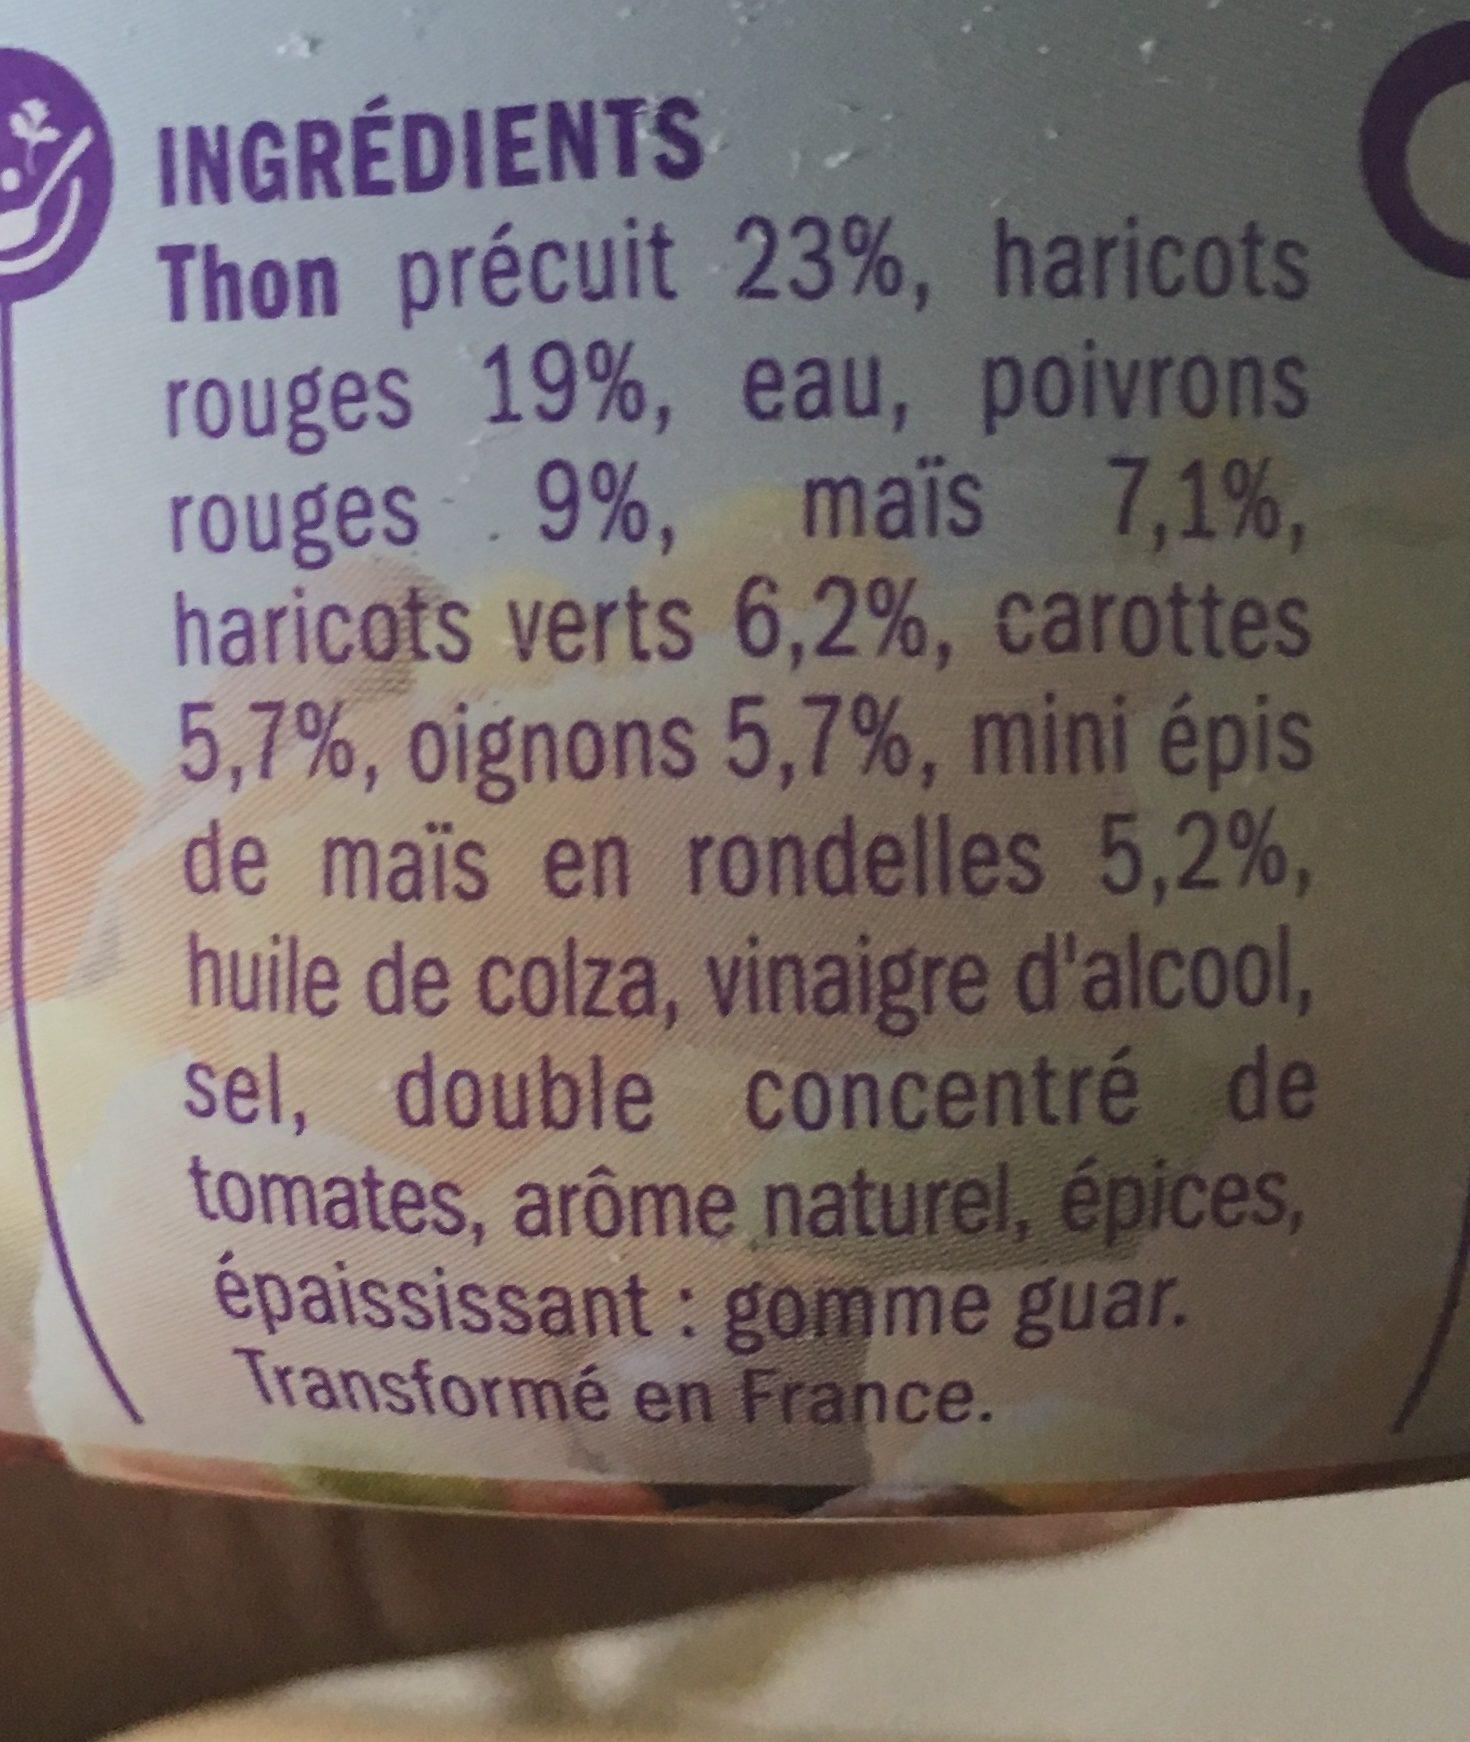 Salade mexicaine au thon - Ingredients - fr